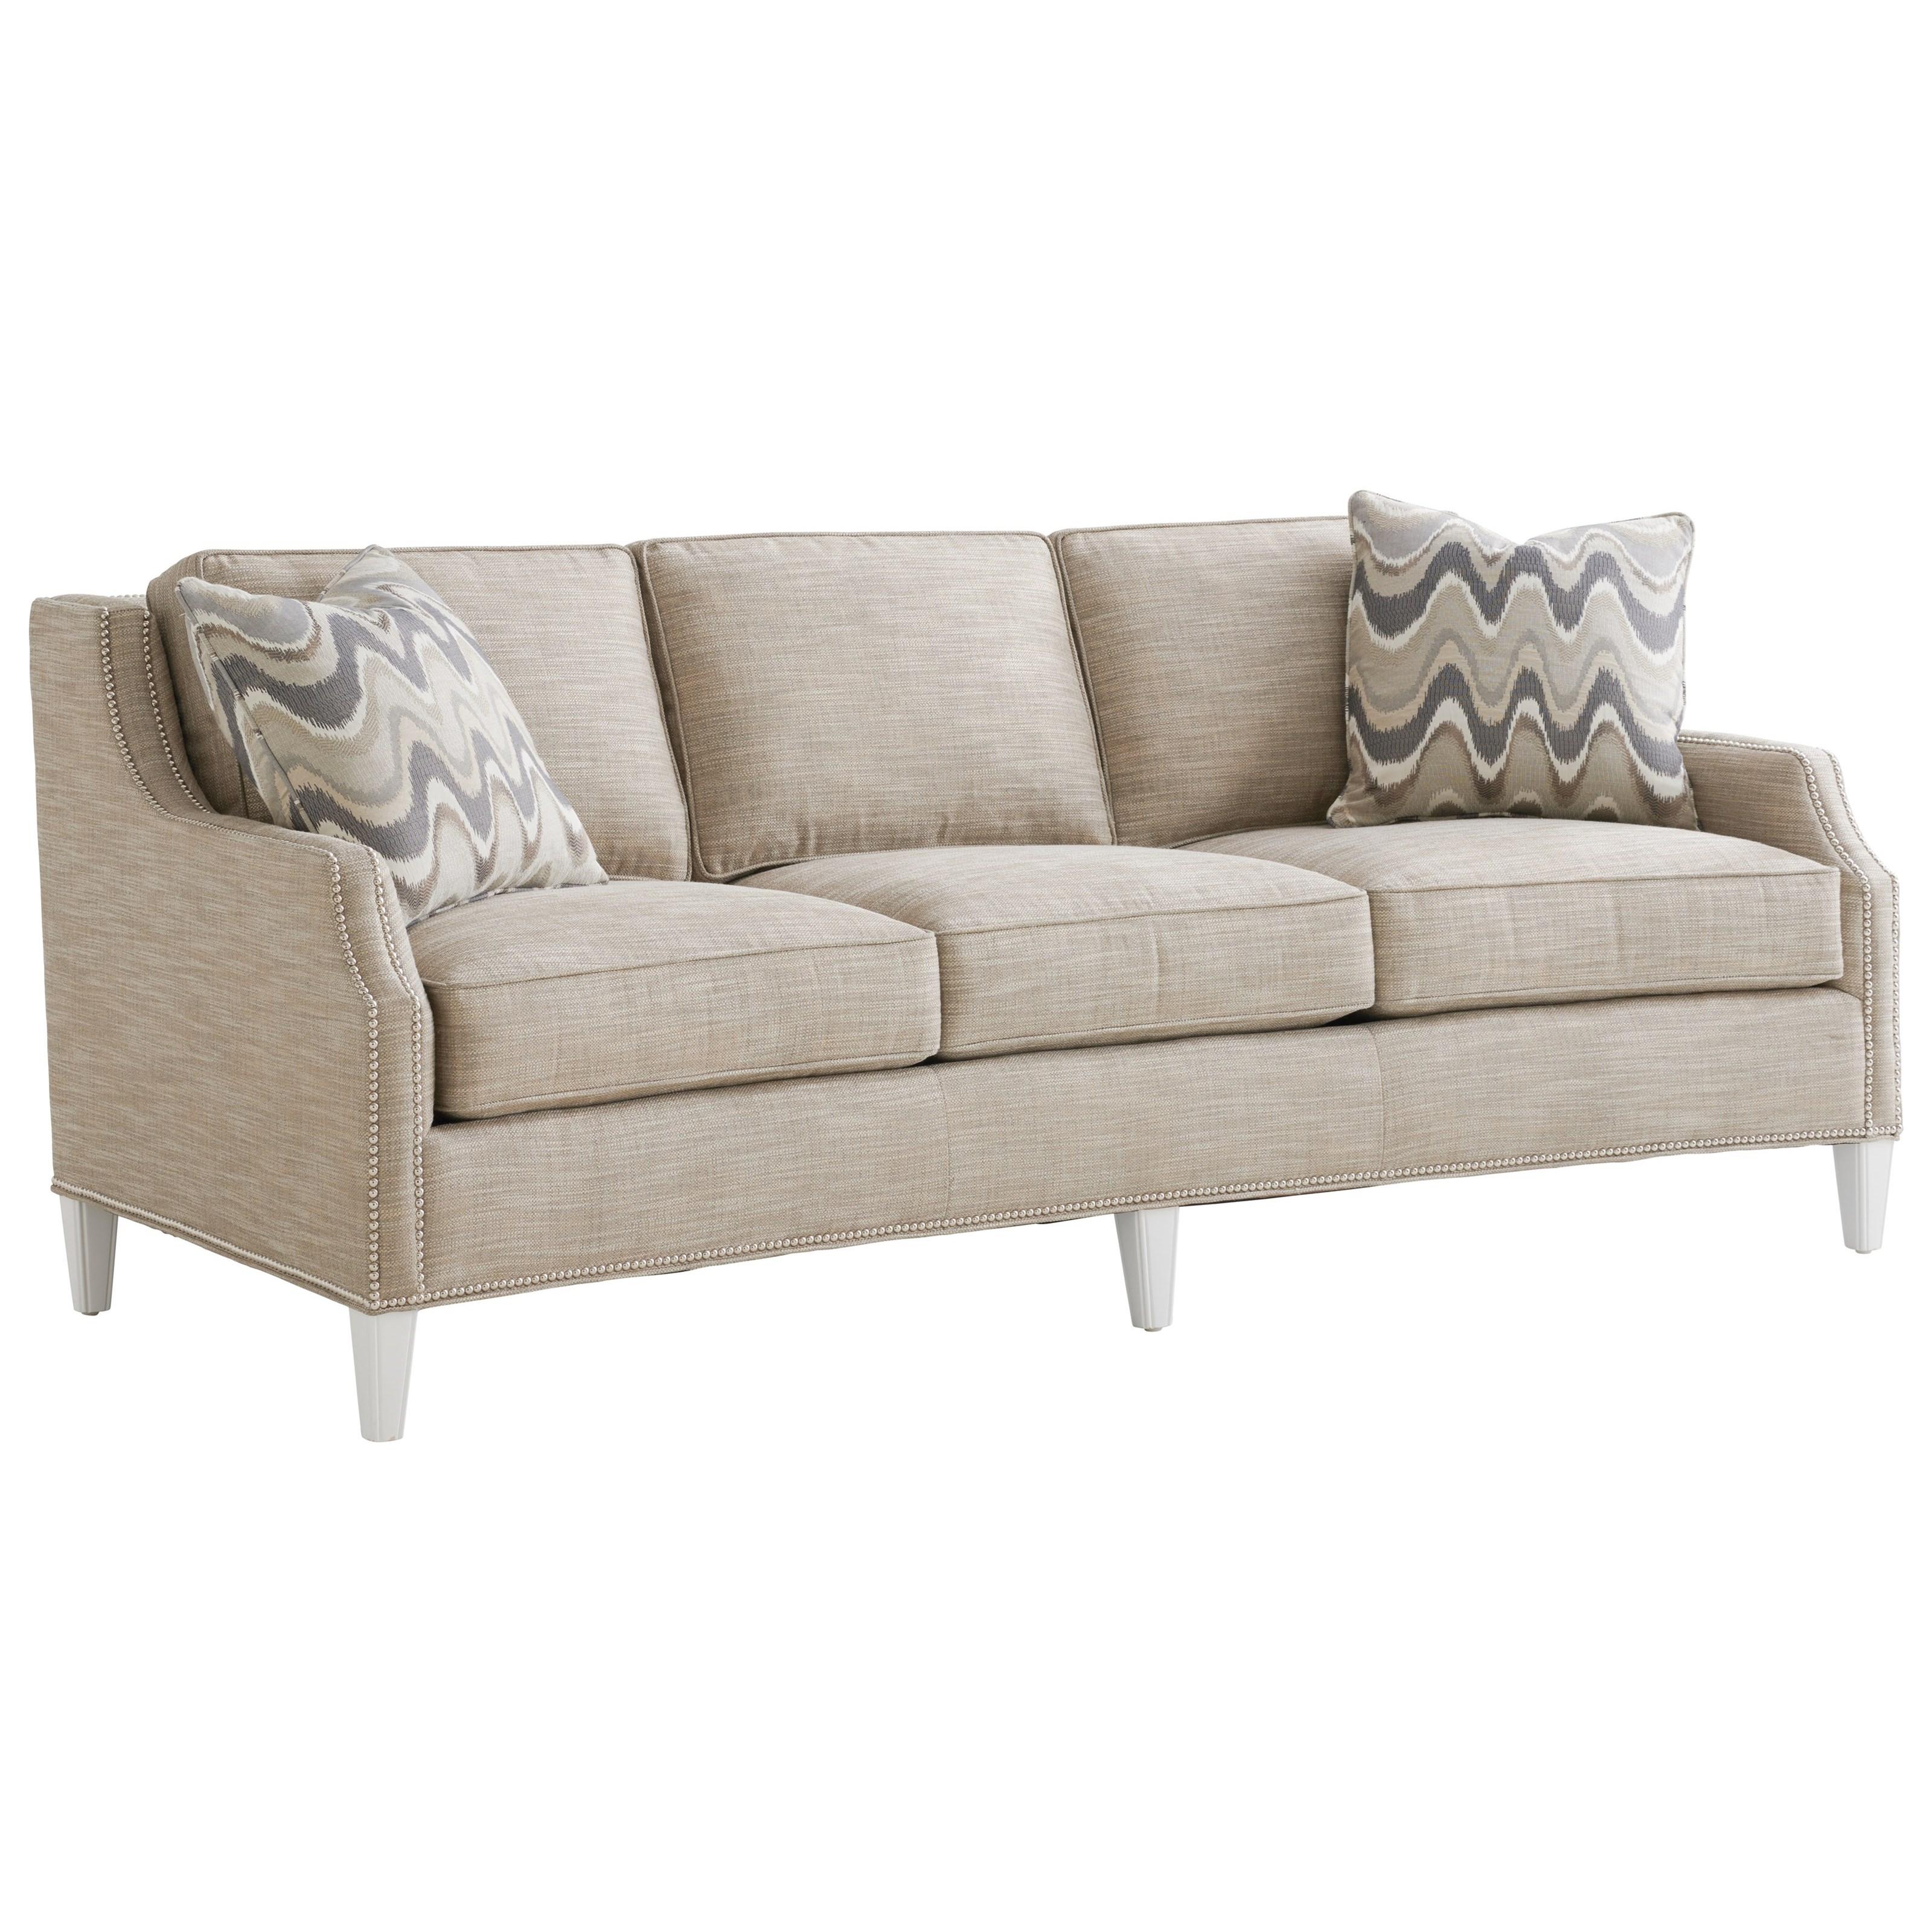 Avondale Signac Sofa by Lexington at Fisher Home Furnishings